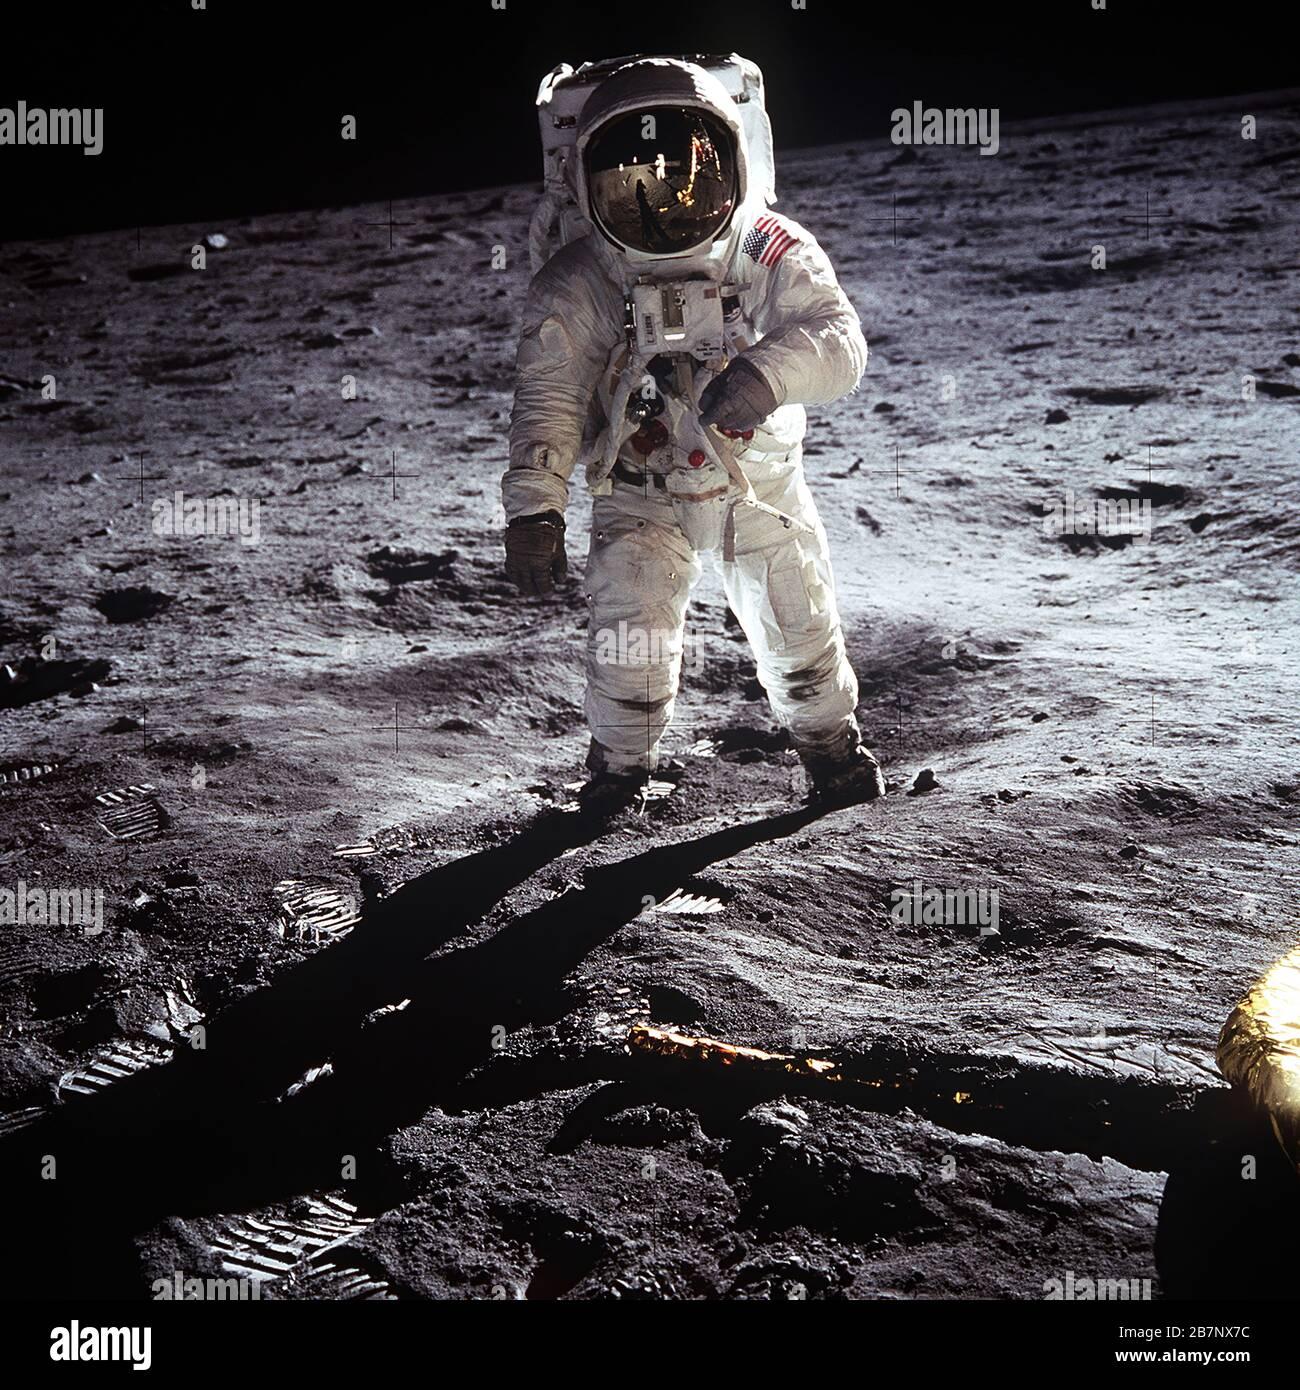 Apollo 13 Mission Astronauts in Prayer after Safe Return New 8x10 NASA Photo